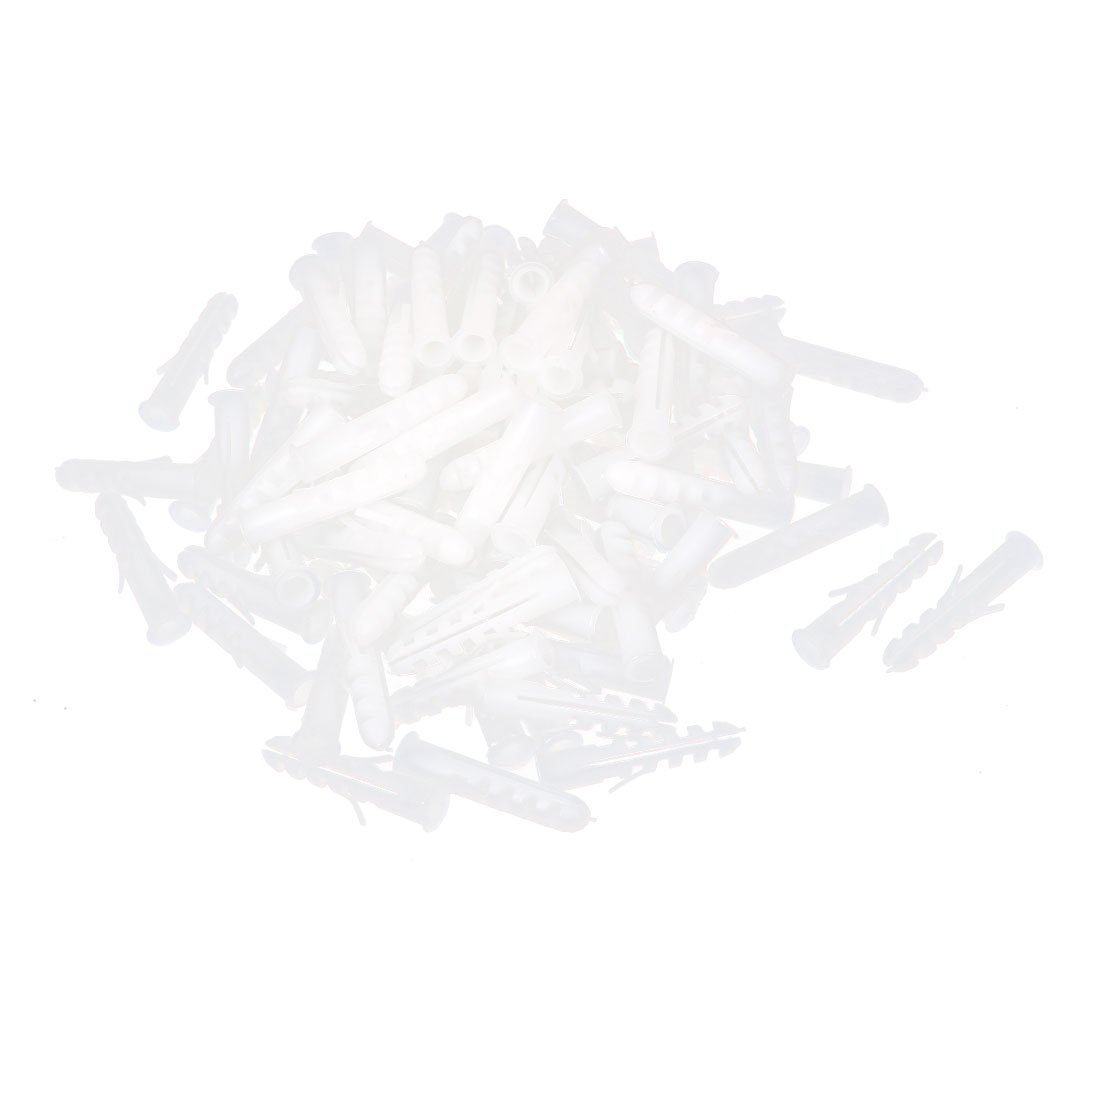 100pcs 40mm Long  Lag Screws Plastic Expansion Nail Plugs 8mm Dia